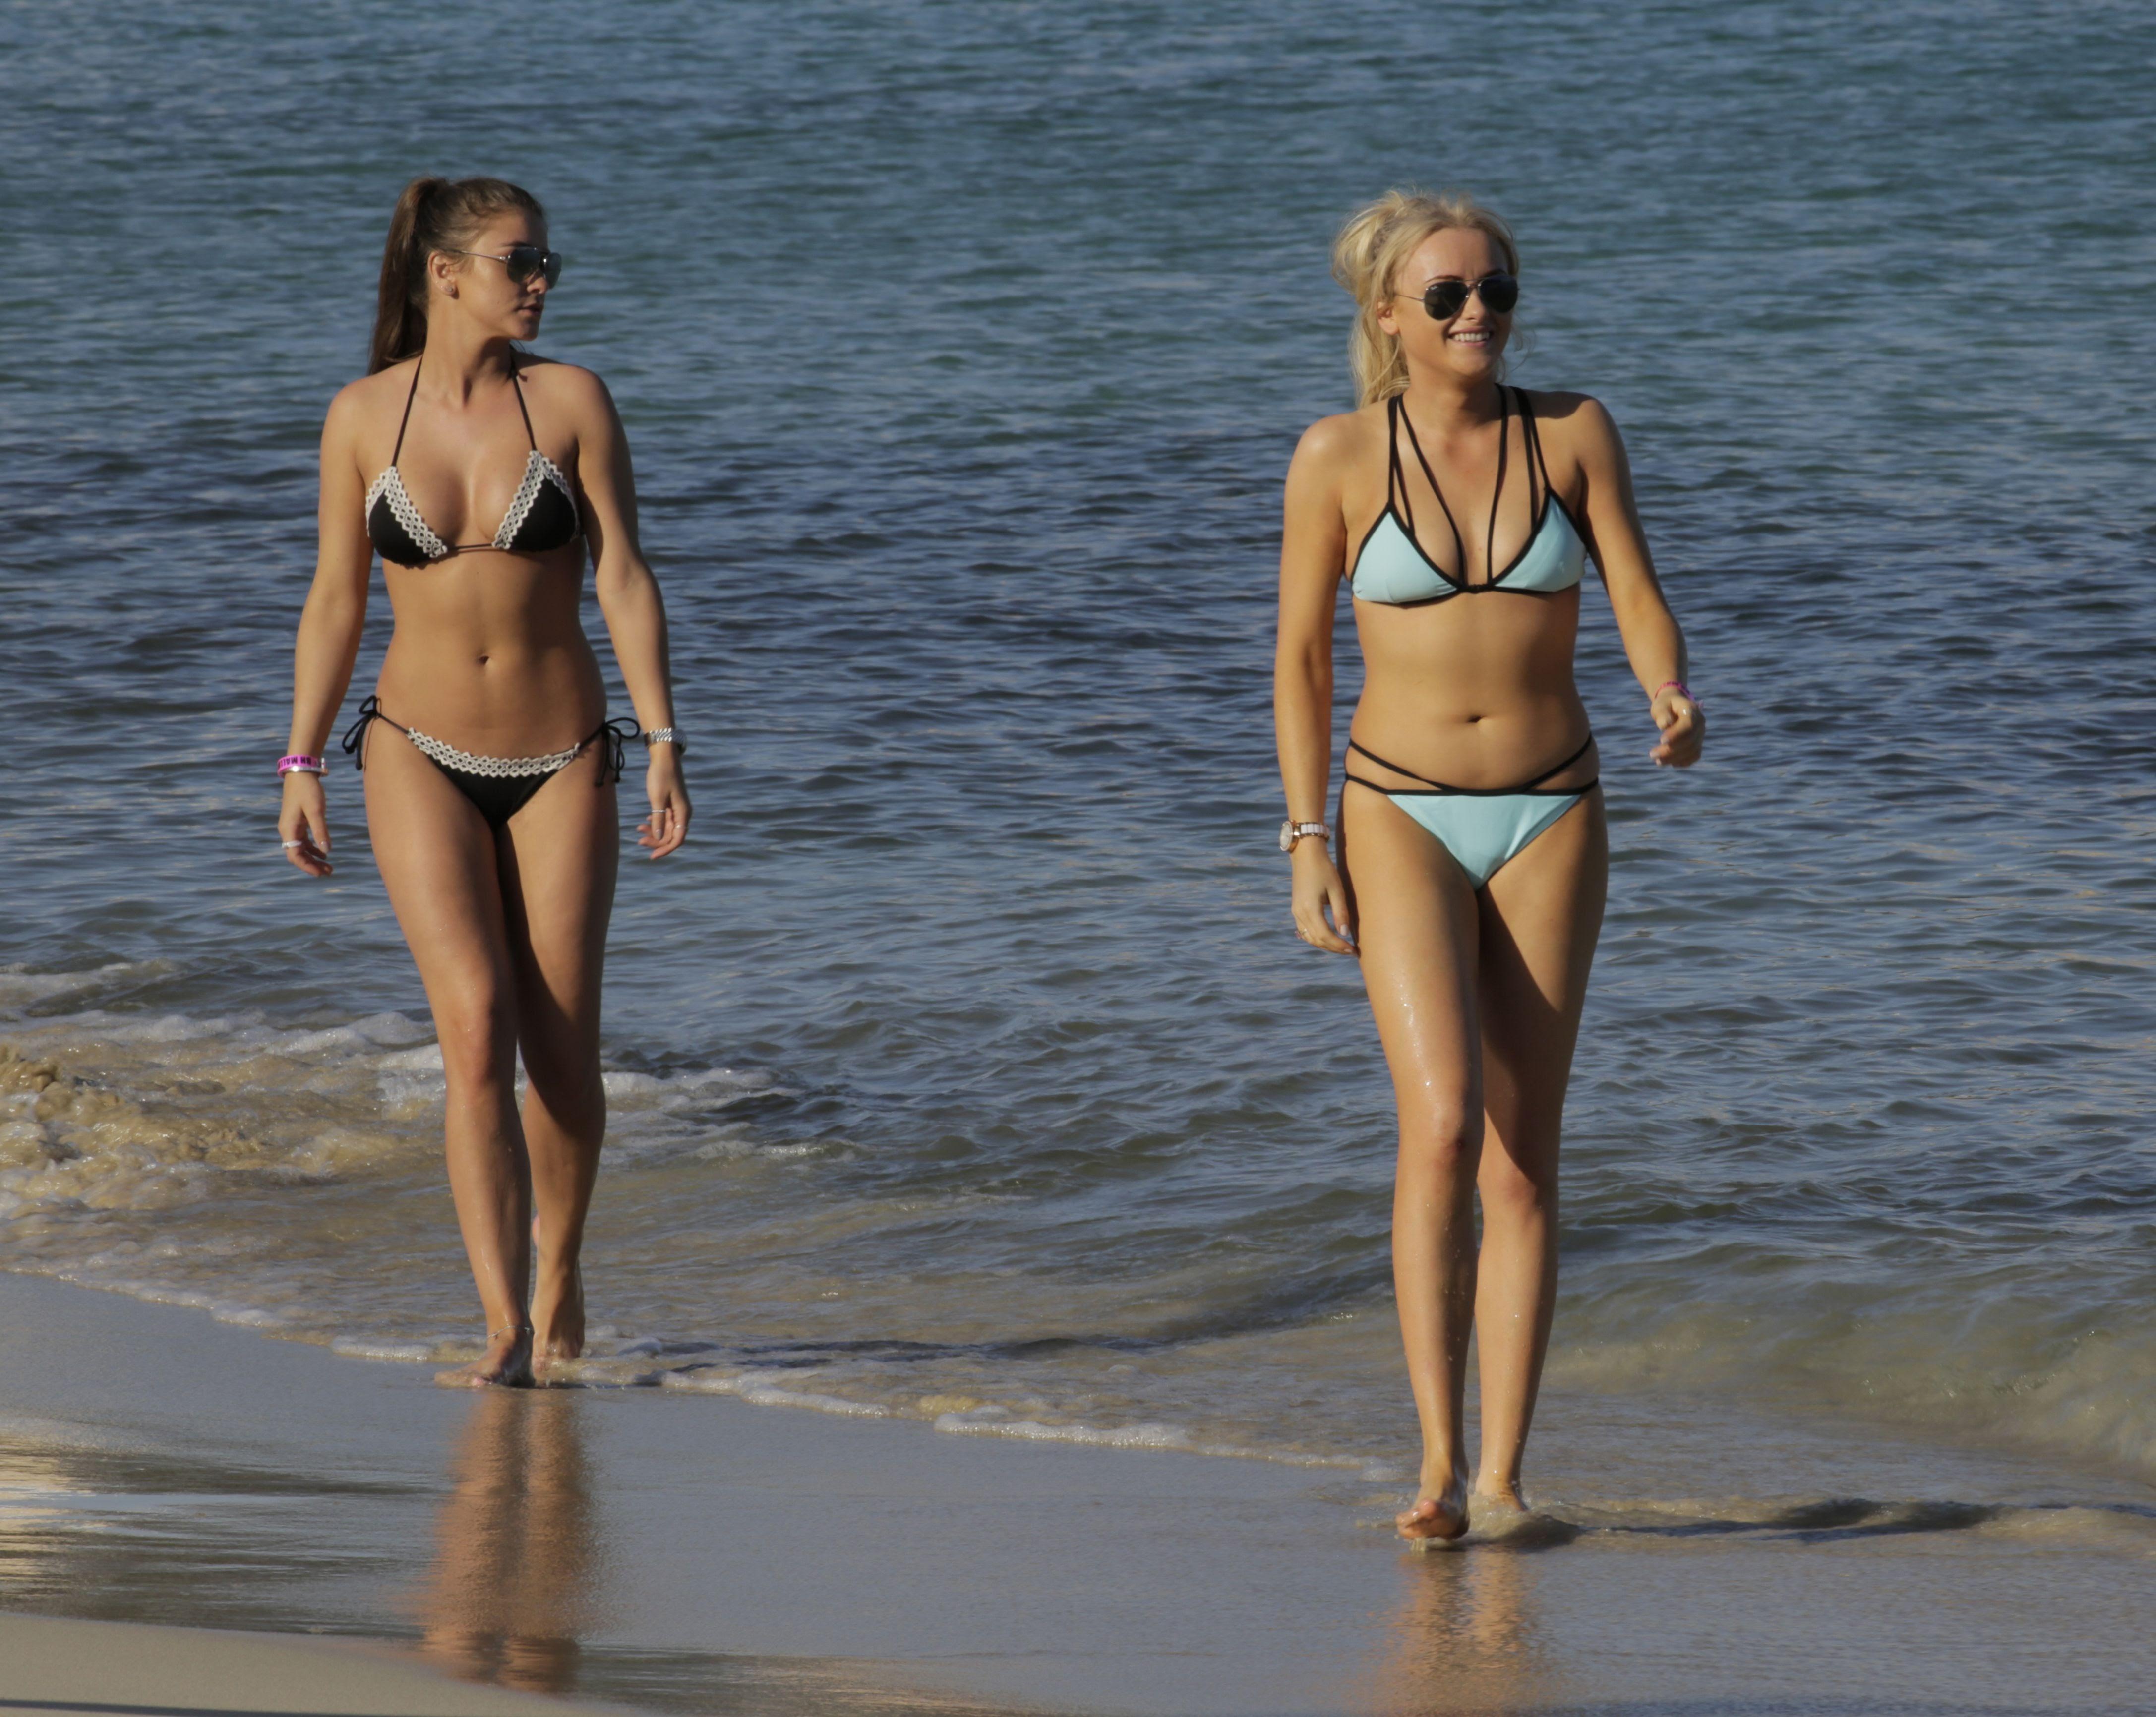 Hot Katie Mcglynn nude (51 photo), Pussy, Bikini, Feet, braless 2006